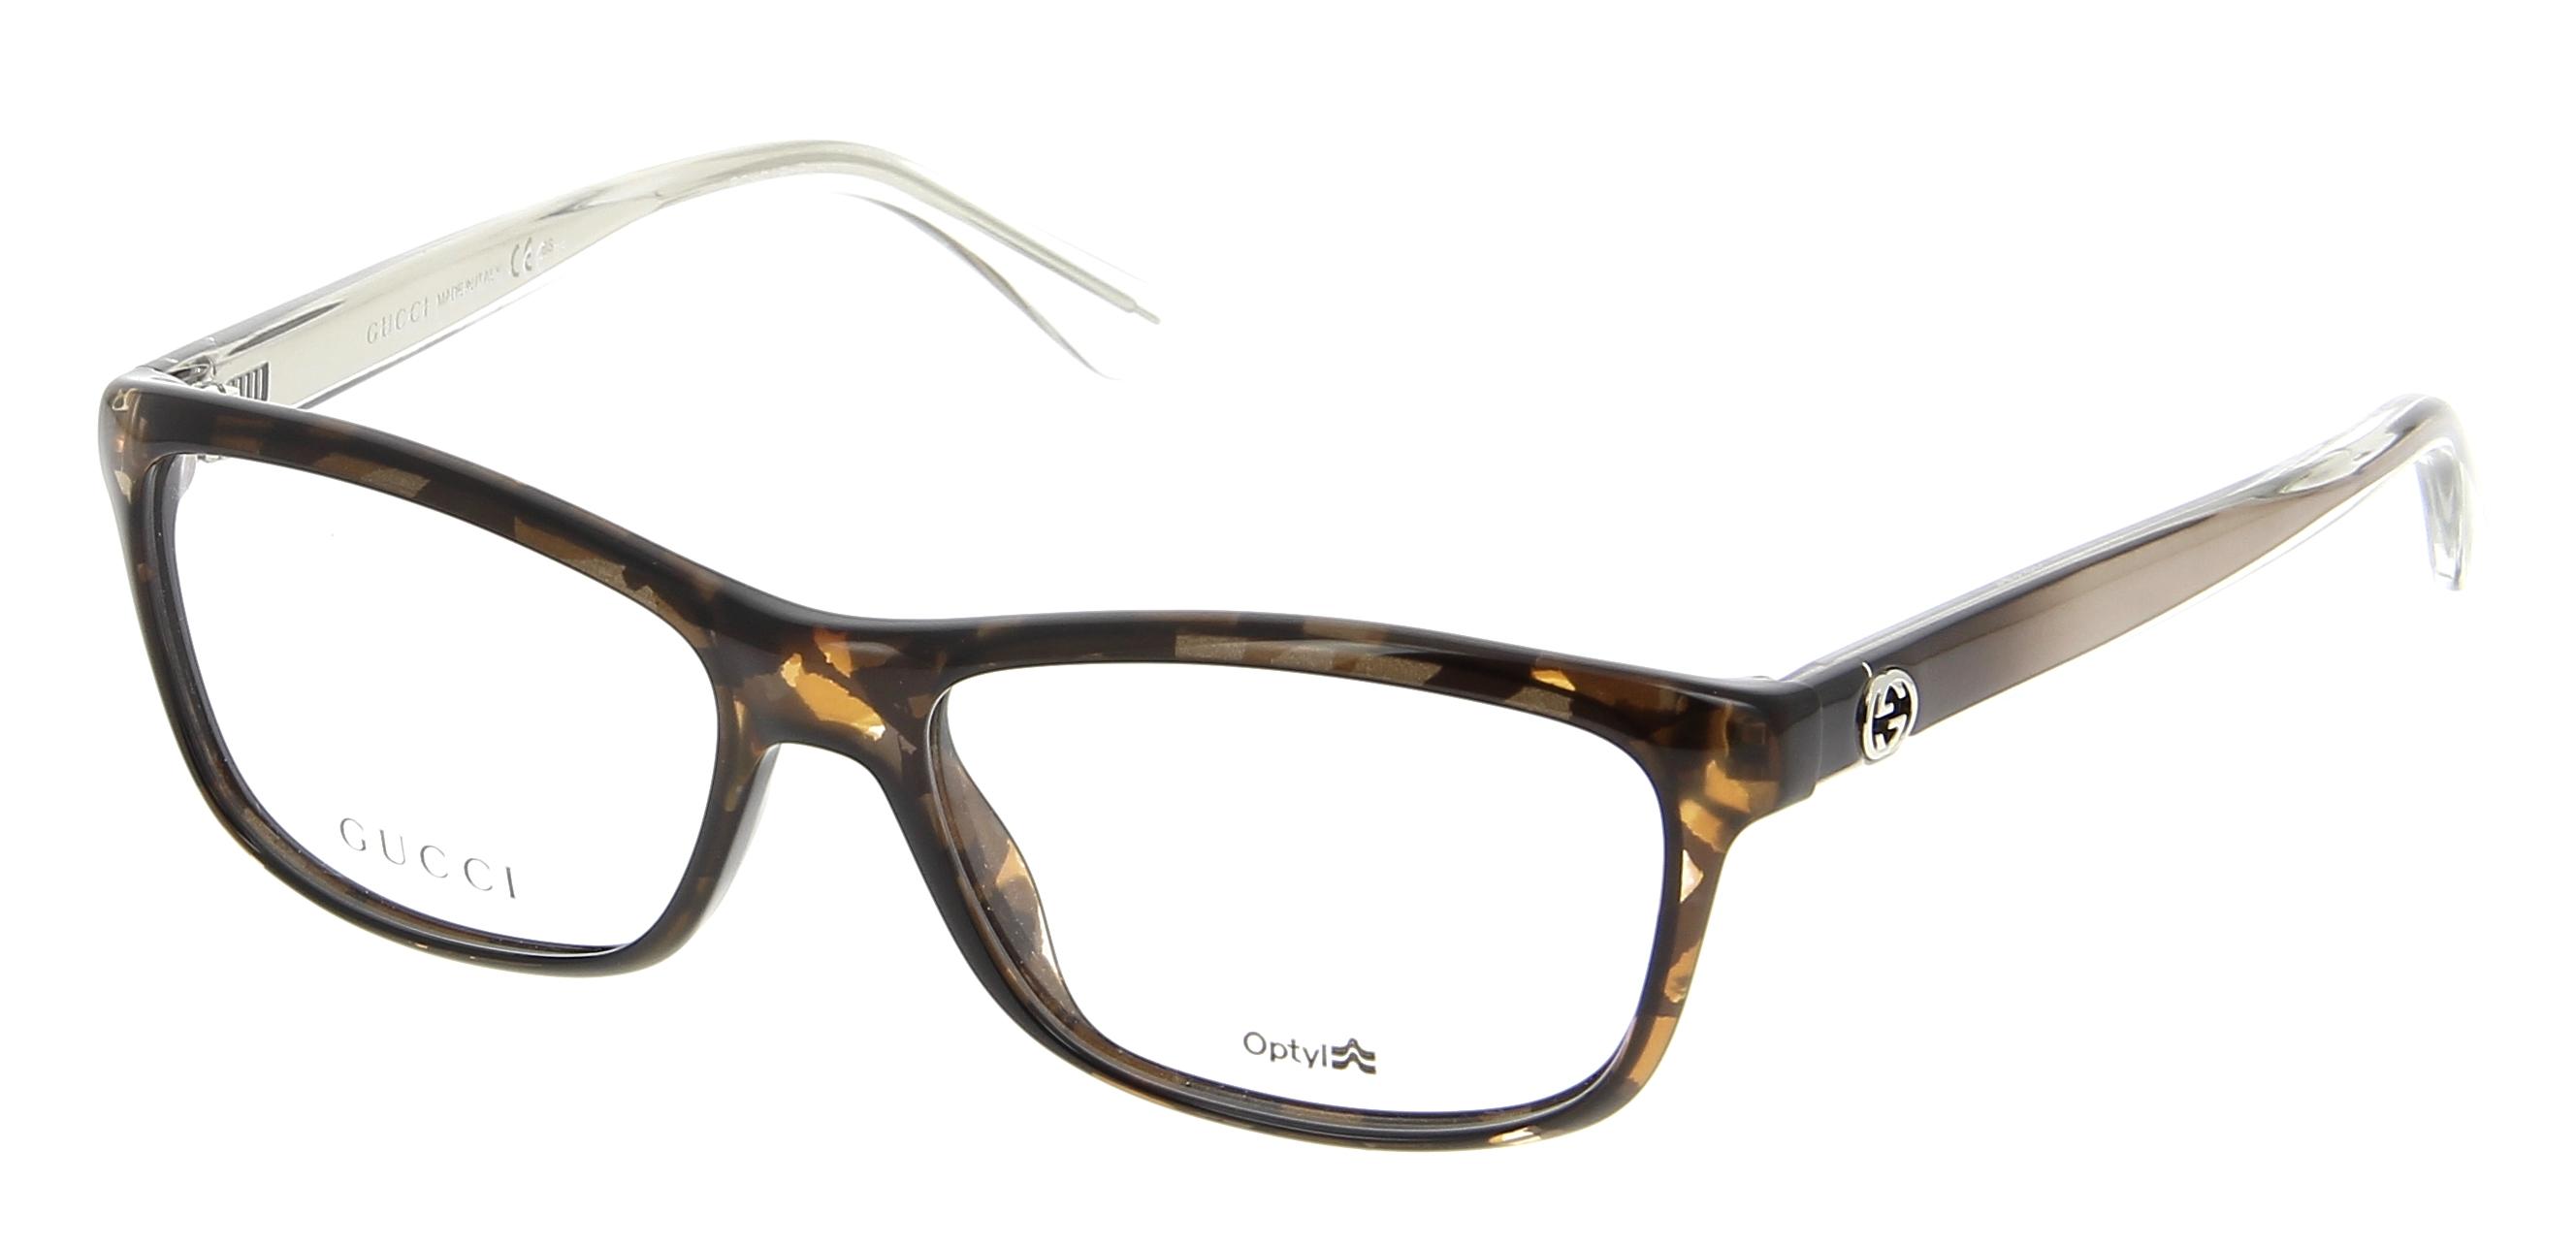 Gucci Full Frame Glasses : Eyeglasses GUCCI GG 3766 H3J 53/15 Woman Ecaille / Marron ...